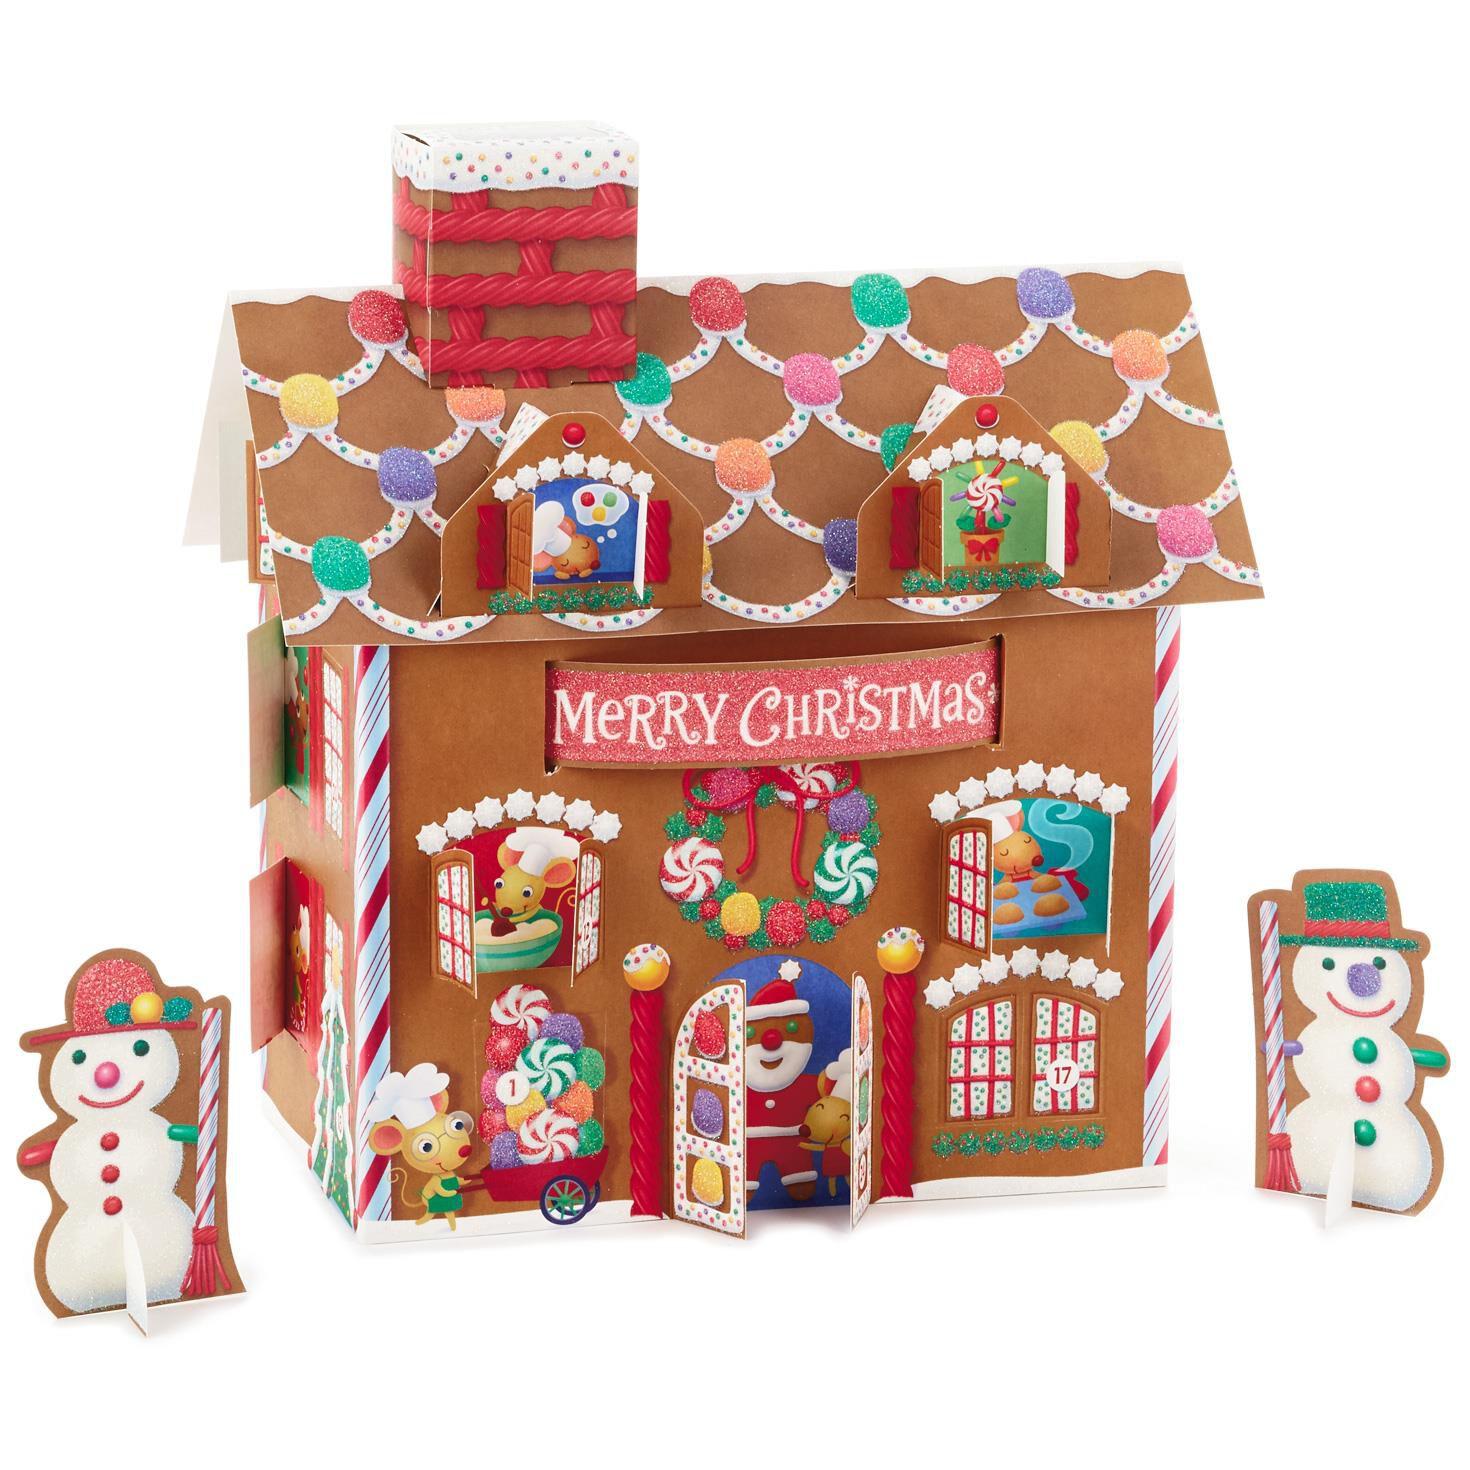 Christmas Gingerbread House.3d Gingerbread House Advent Calendar